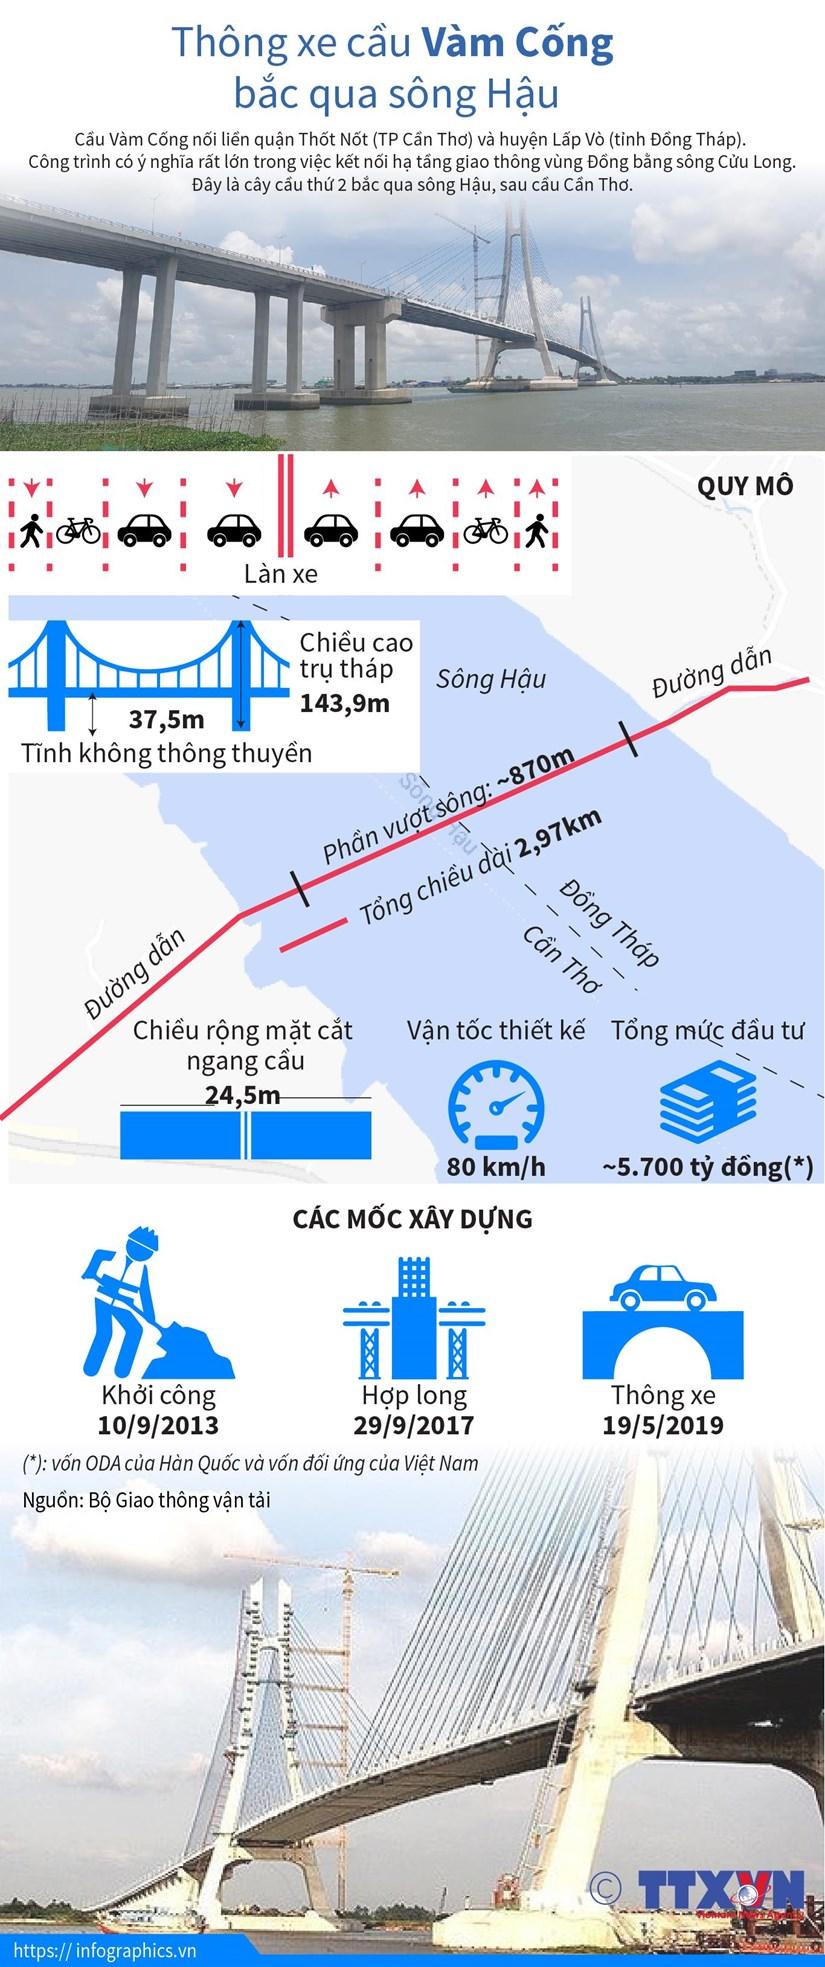 [Infographics] Chinh thuc thong xe cau Vam Cong bac qua song Hau hinh anh 1